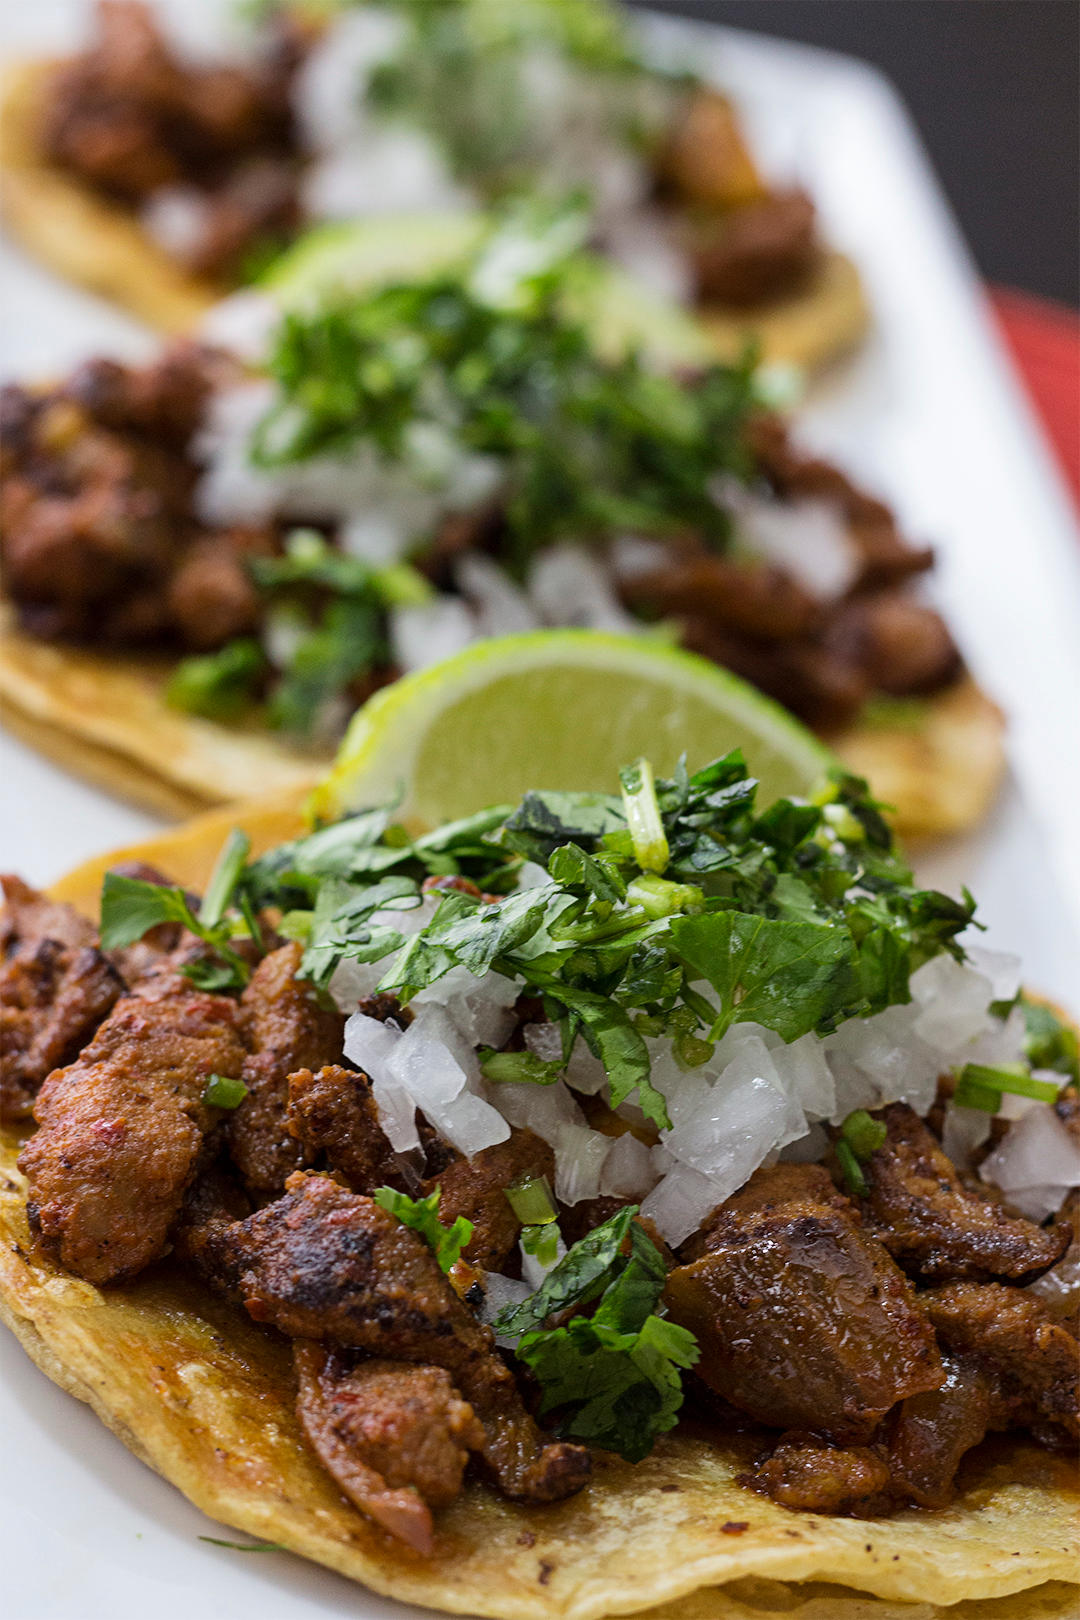 Habanero Mexican Restaurant image 5